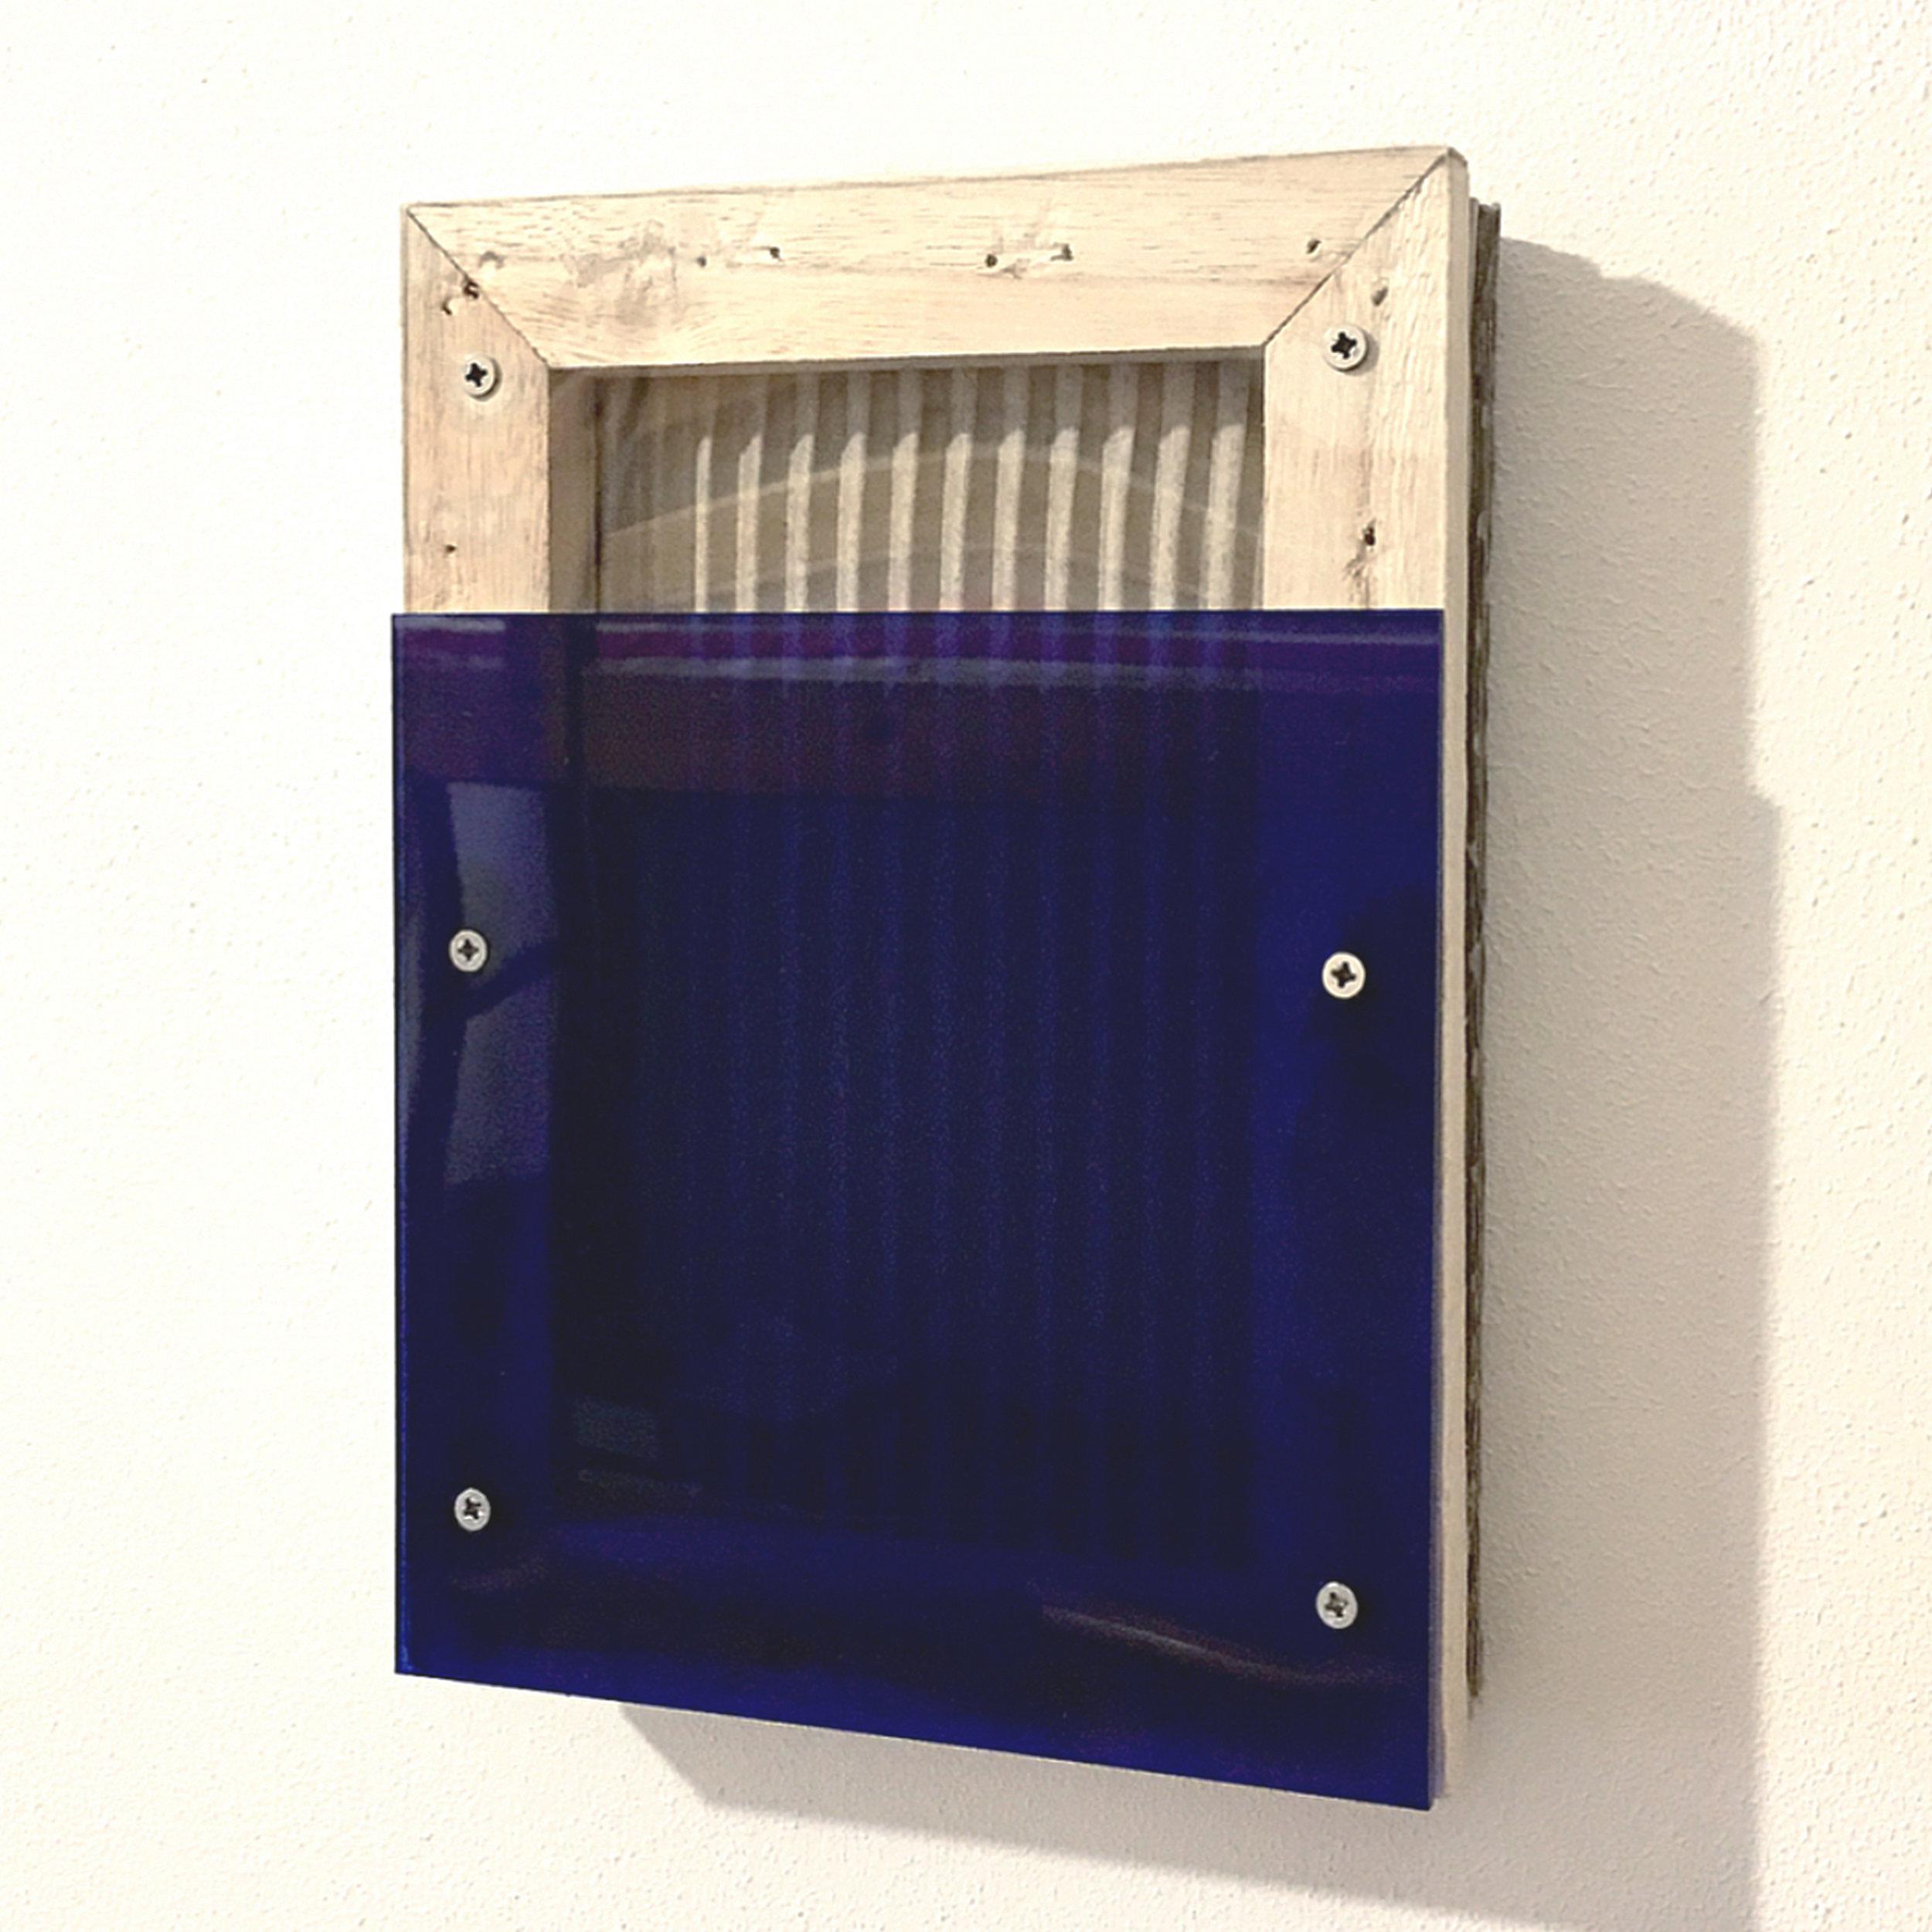 RAL 2.0  Cardboard, blue and transparent plexiglas, screws, on wooden canvas 8.27 x 5.90 x 1.38 inches 21 x 15 x 3.5 cm 2018